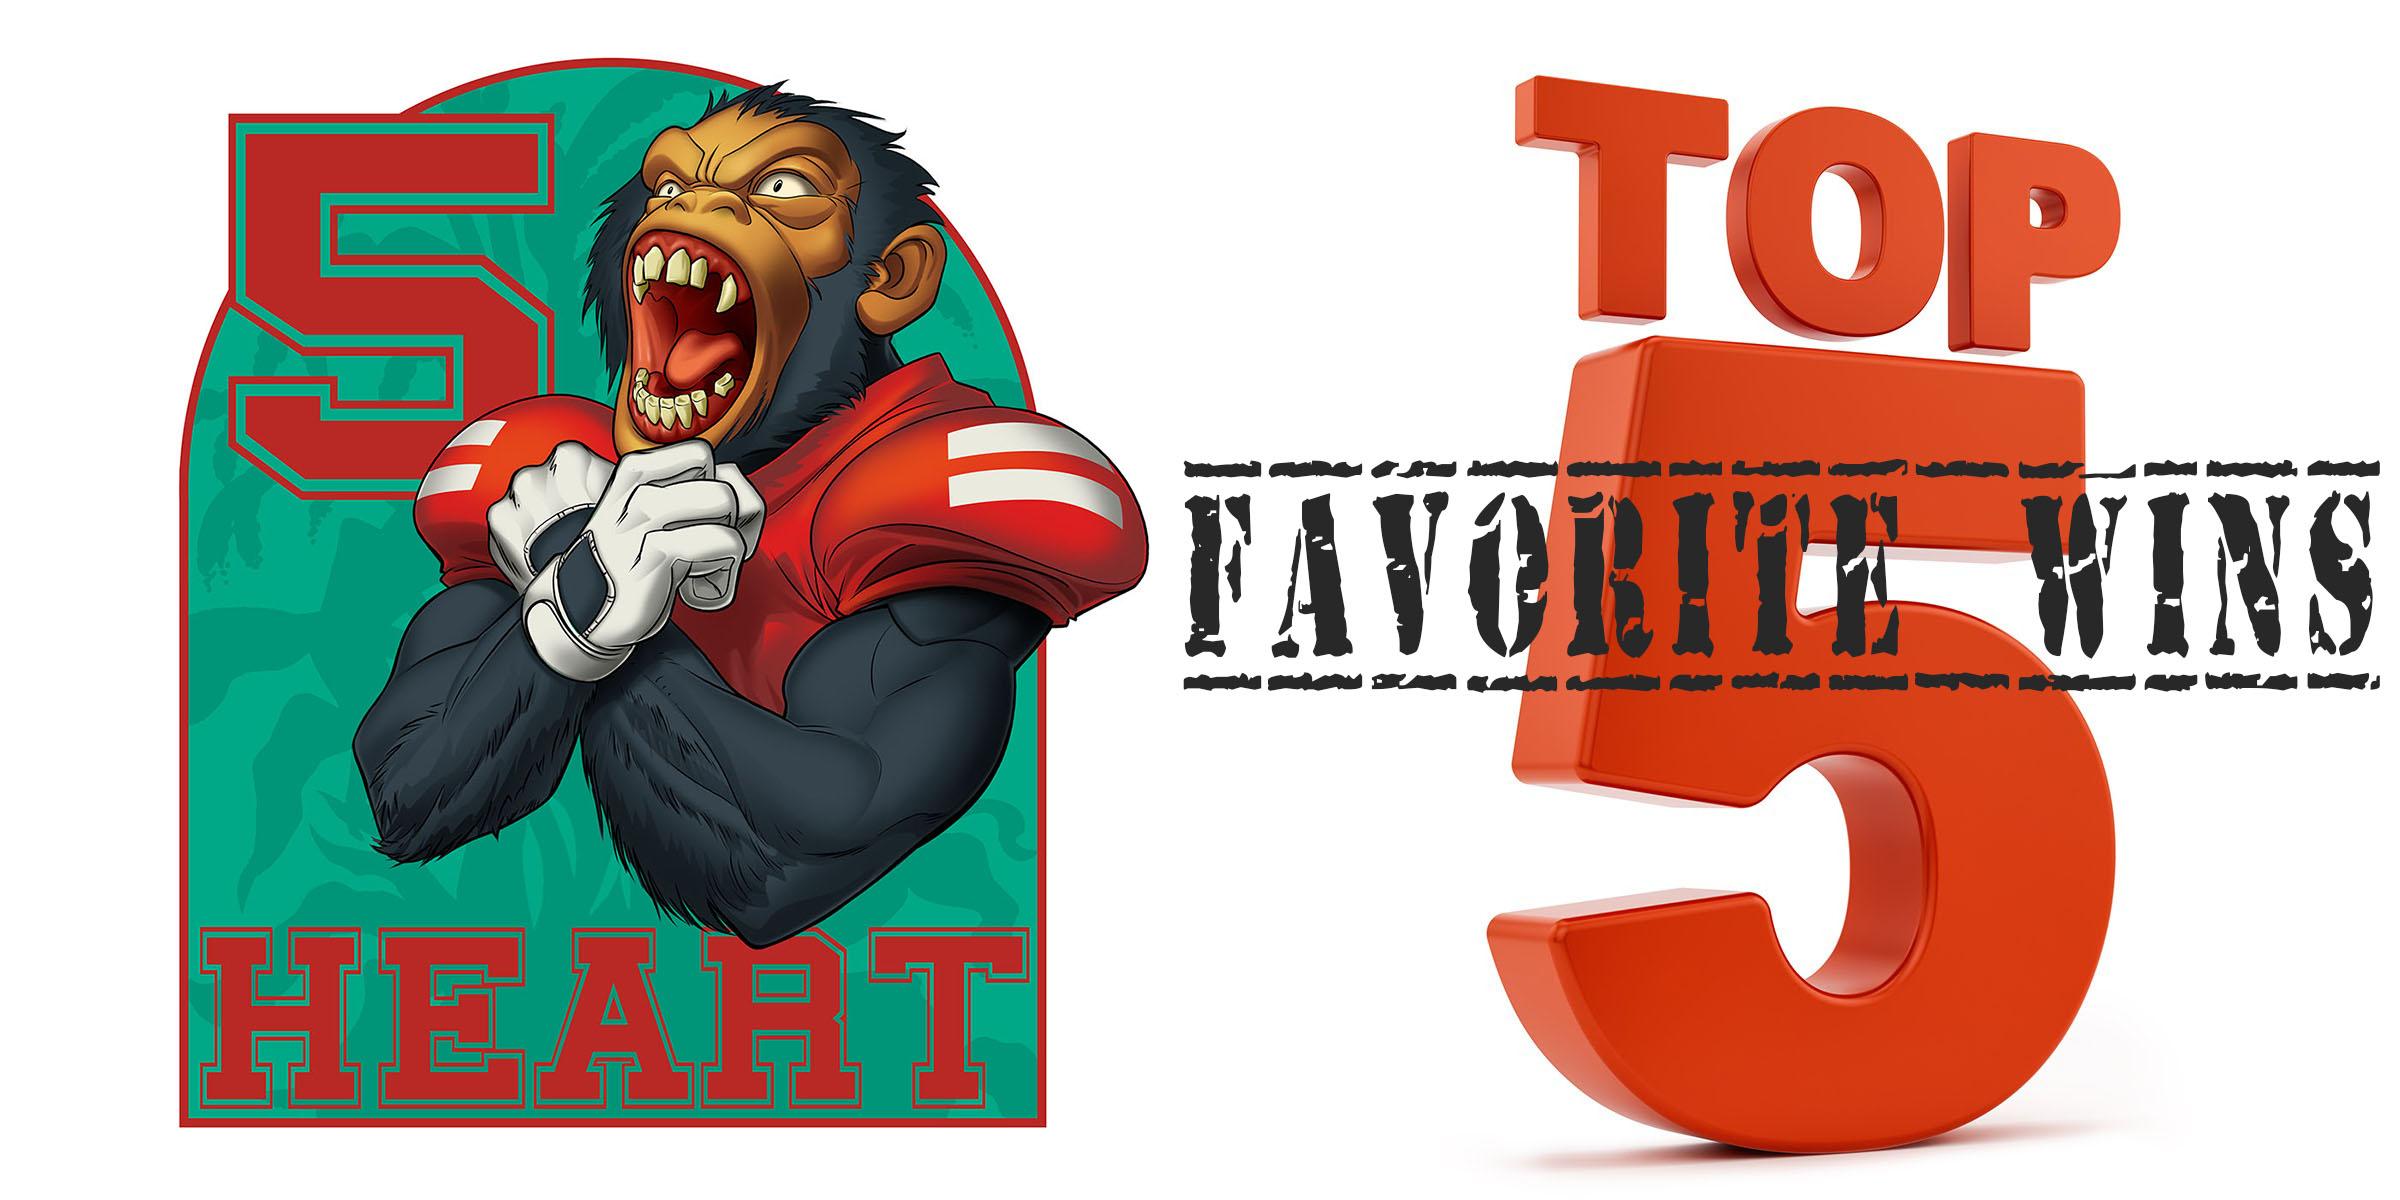 Five Heart Podcast Episode 59: Top 5 Favorite Husker Football Wins